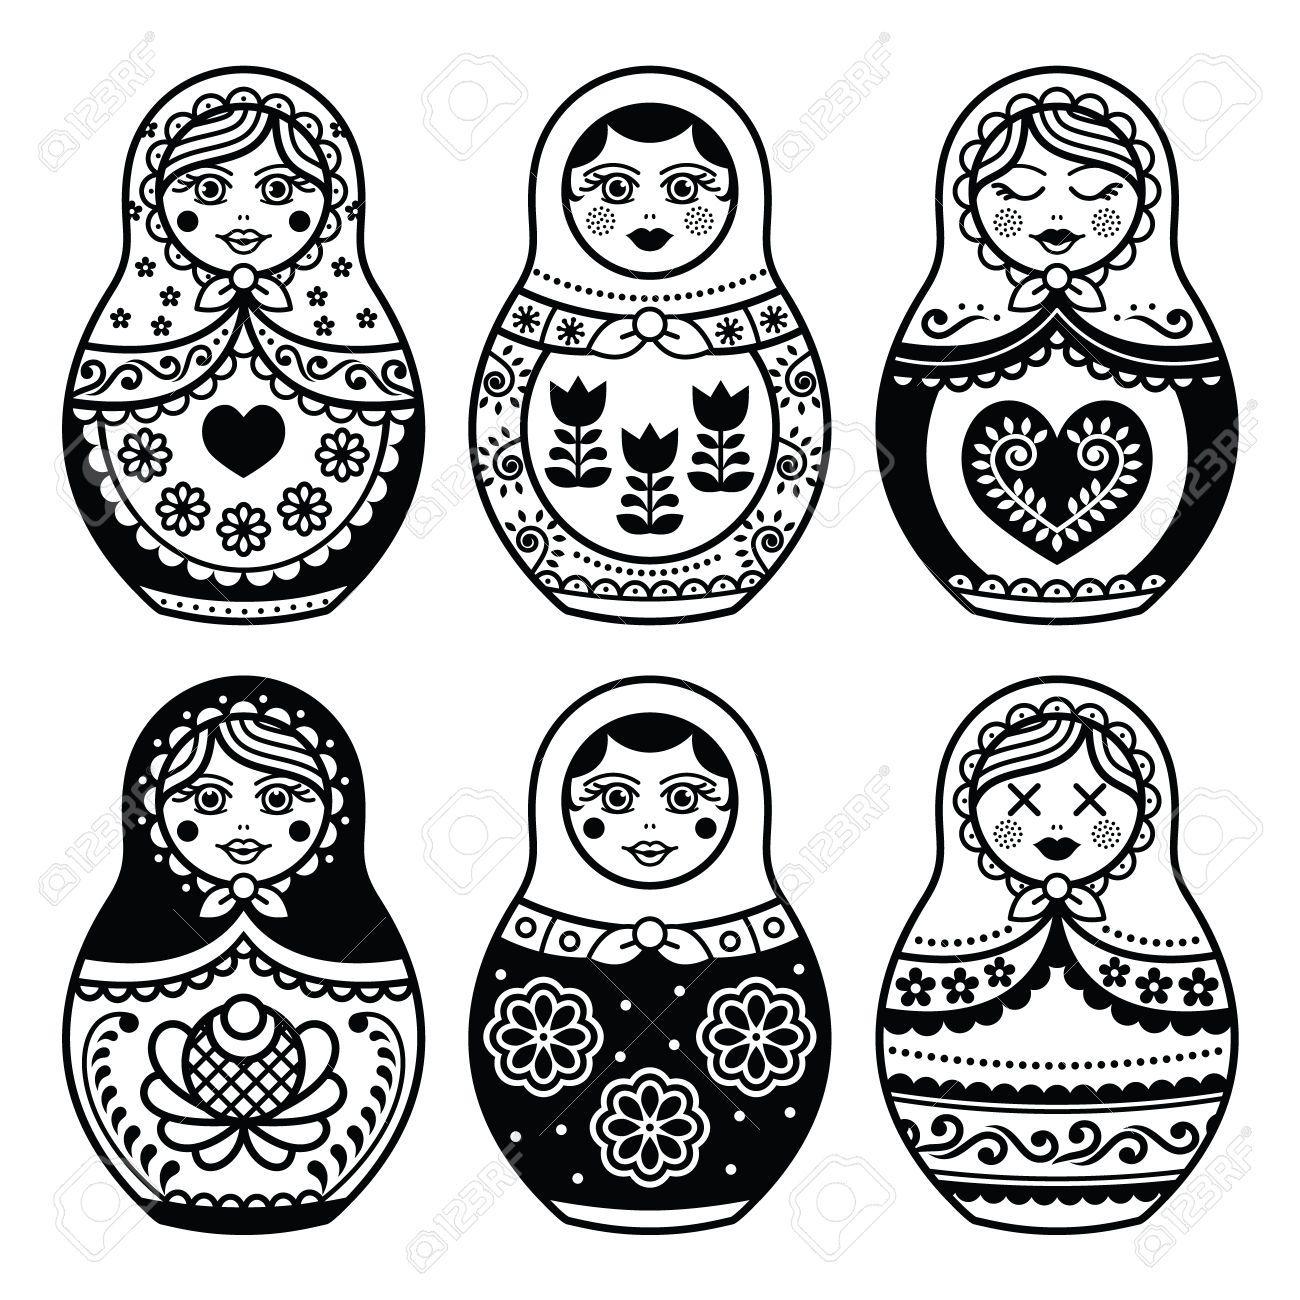 Tapestry motif - square - run through a pattern generator | Art ...